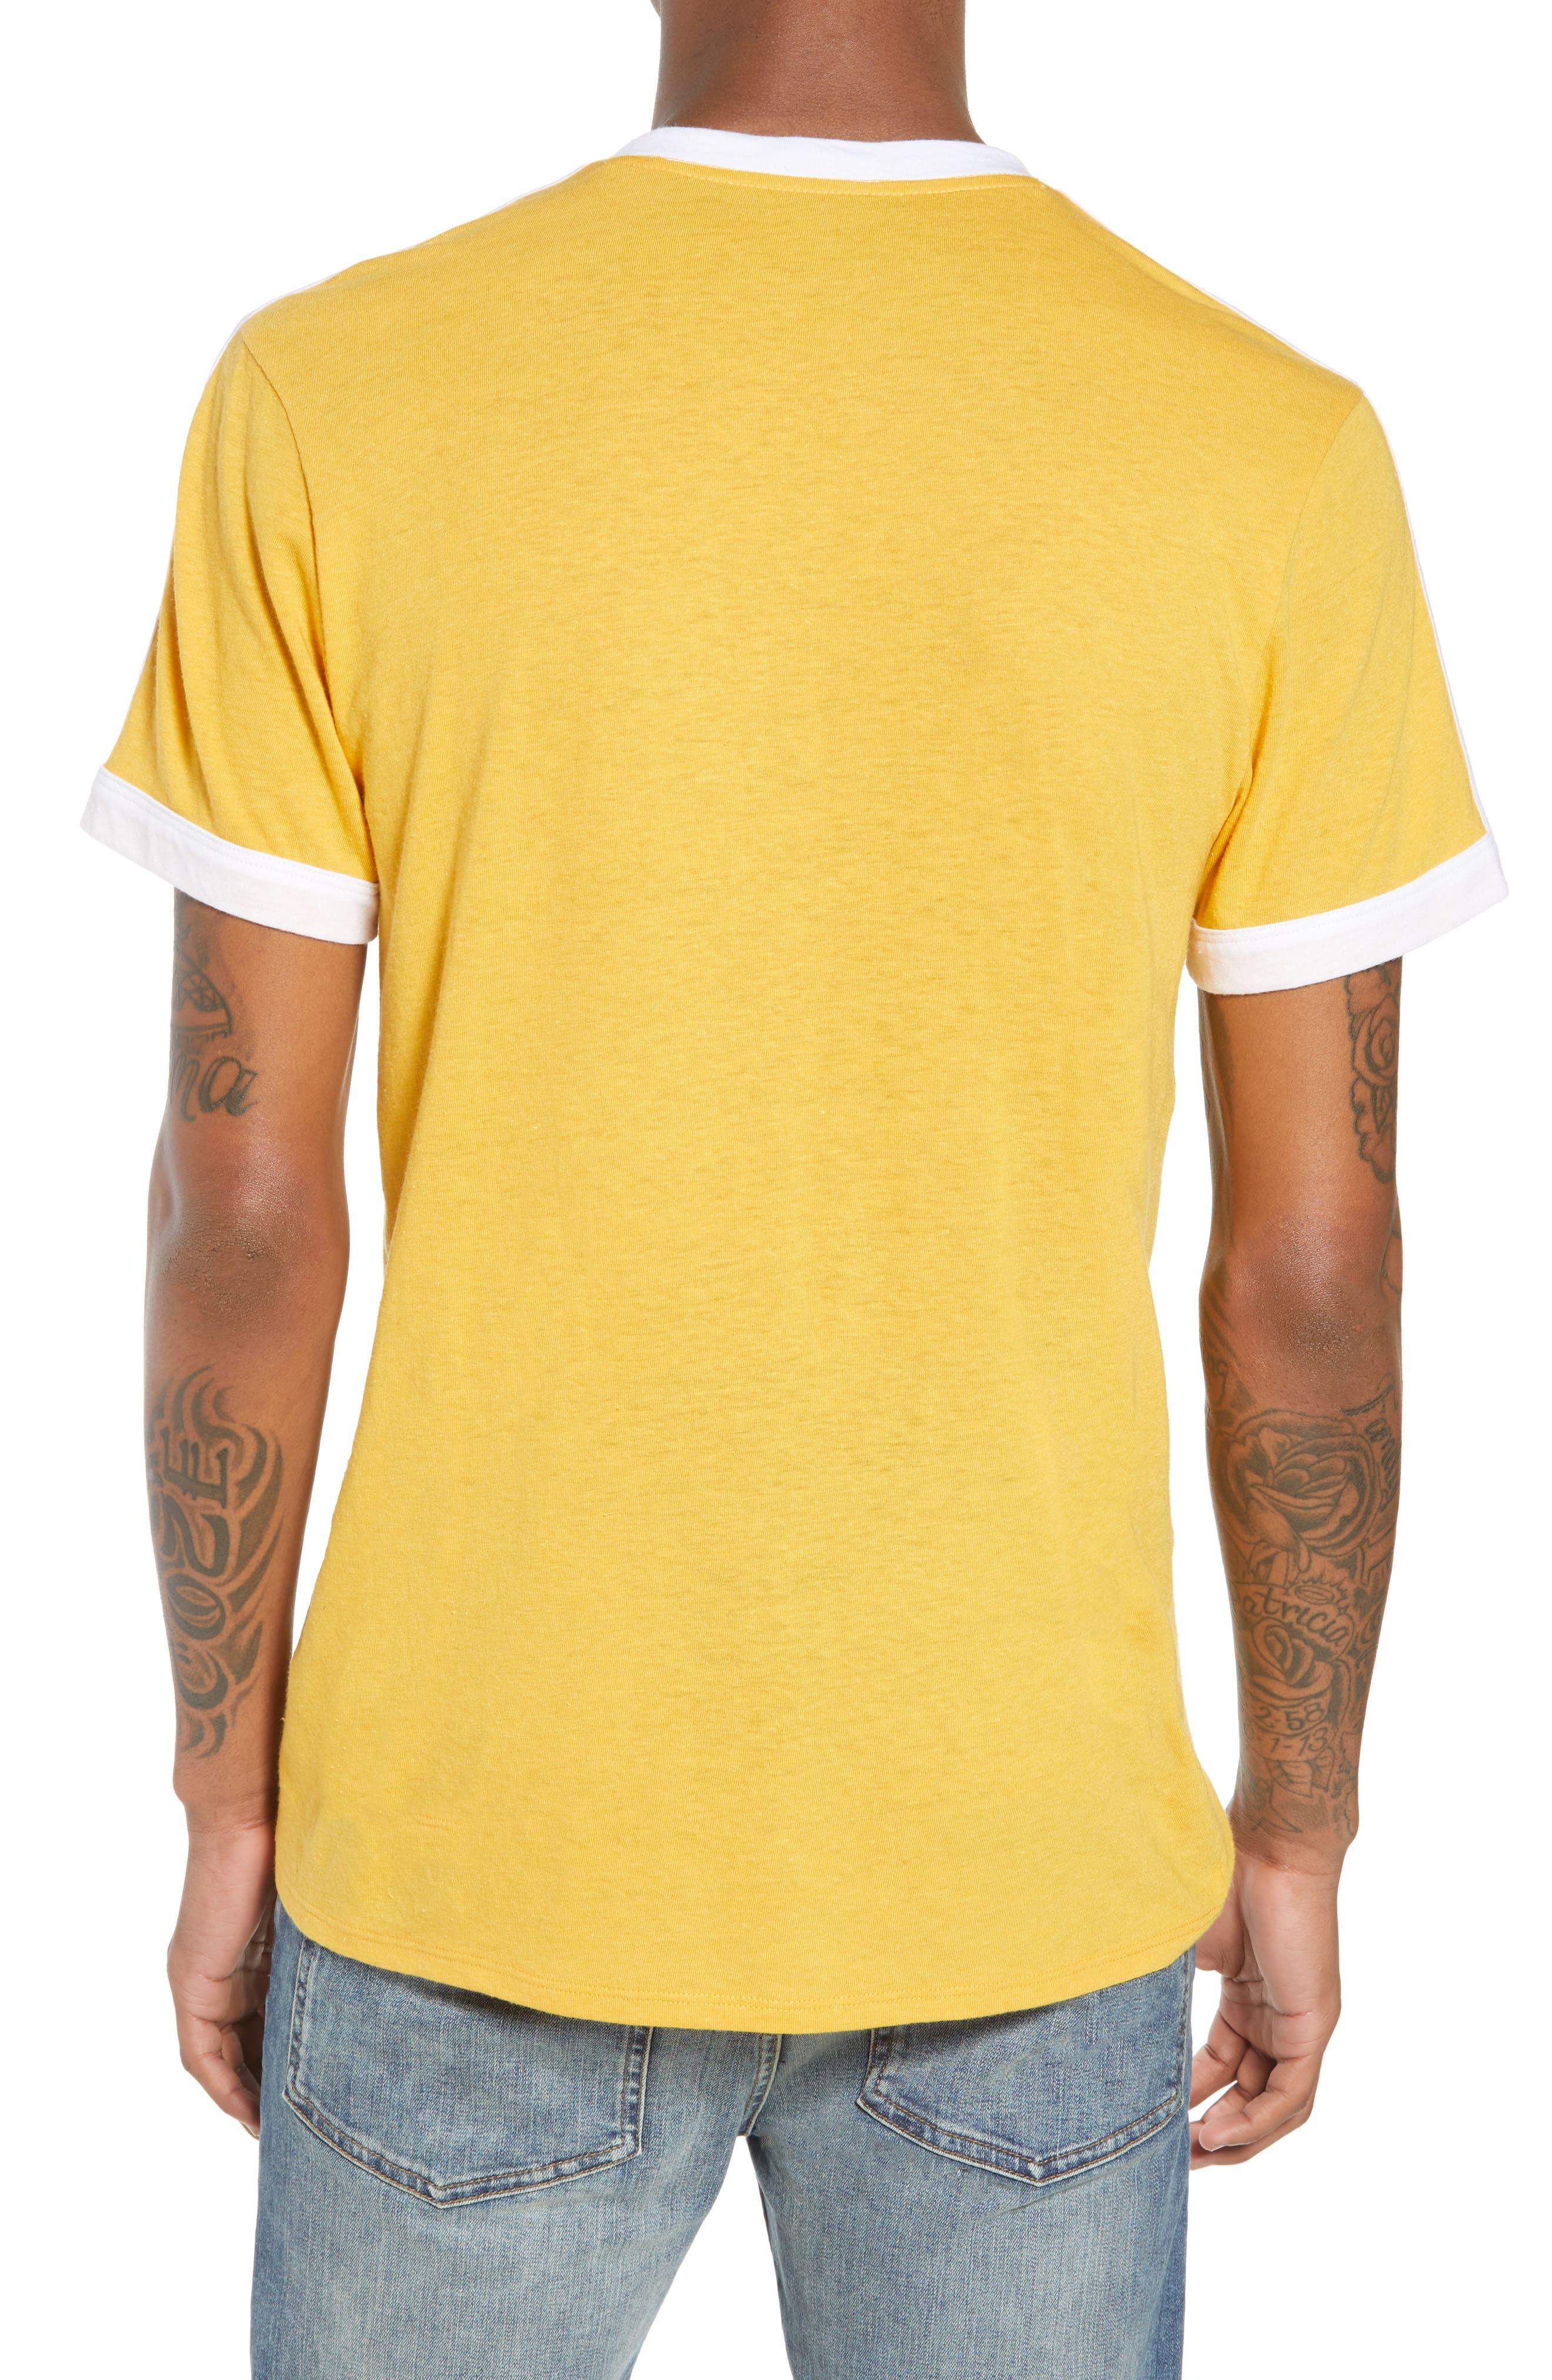 Vintage Athletic V-Neck T-Shirt,                             Alternate thumbnail 2, color,                             Yellow Mineral / White Stripe